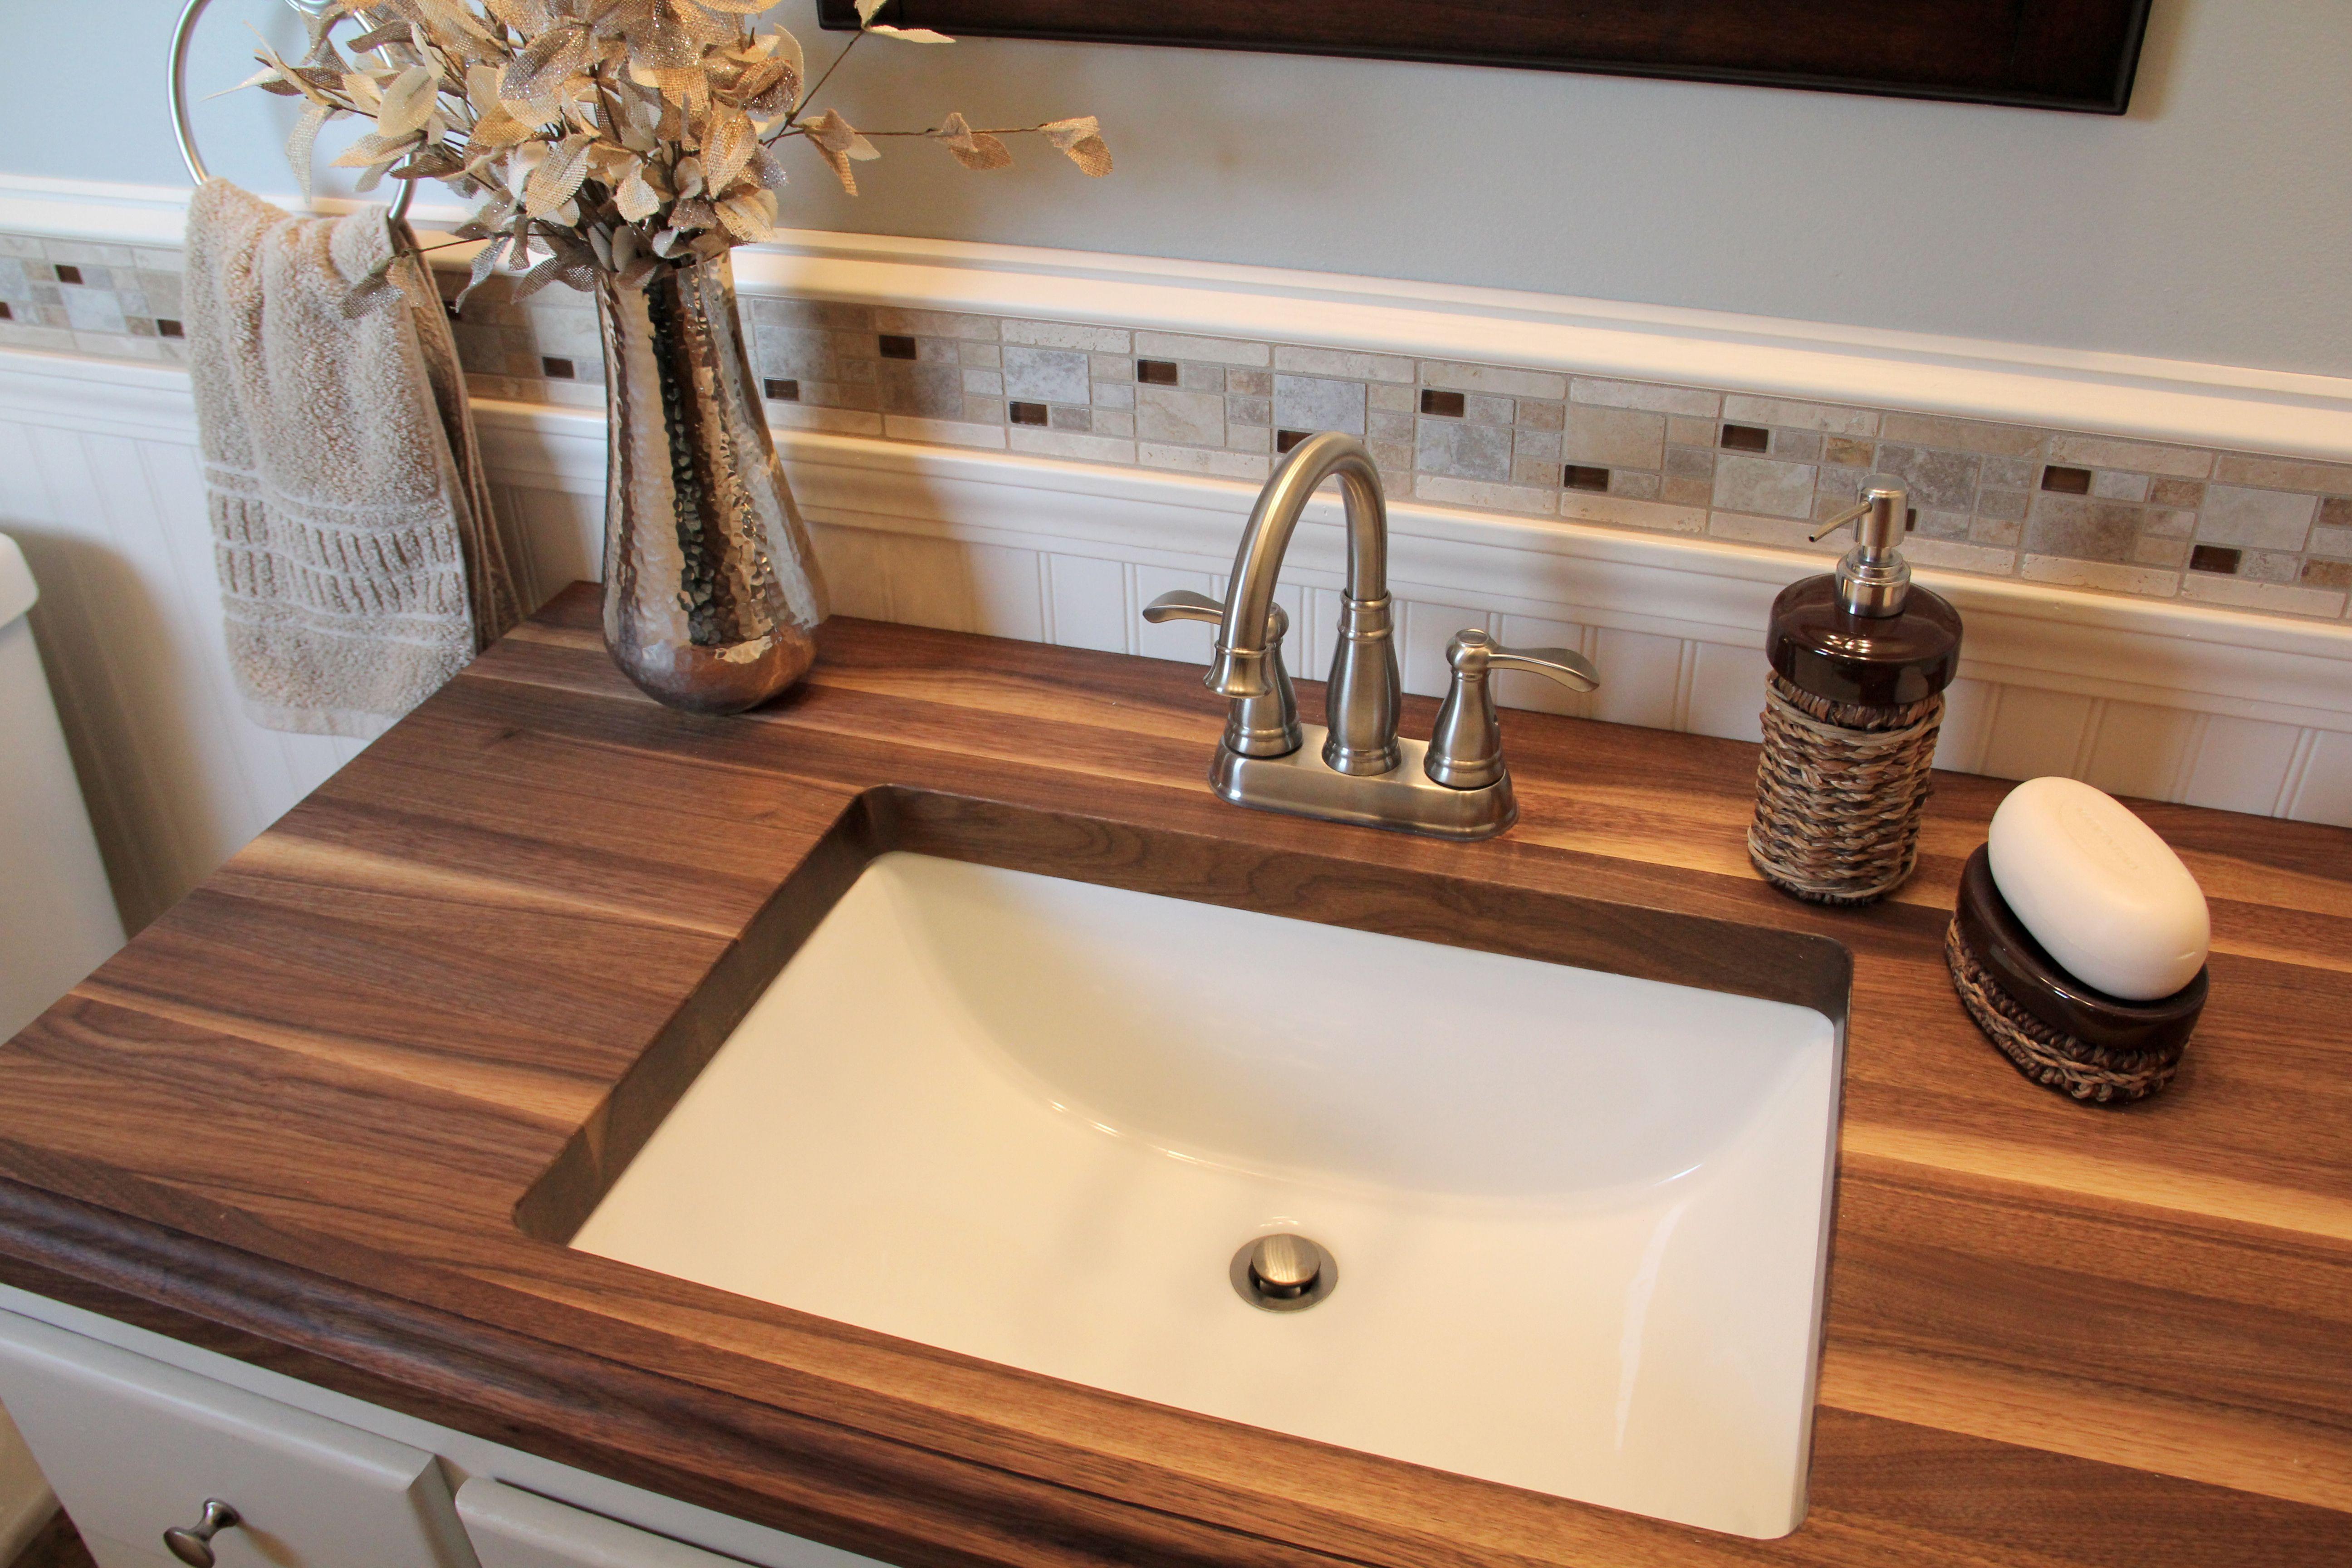 Small bathroom with Walnut Wood Countertop - www ...